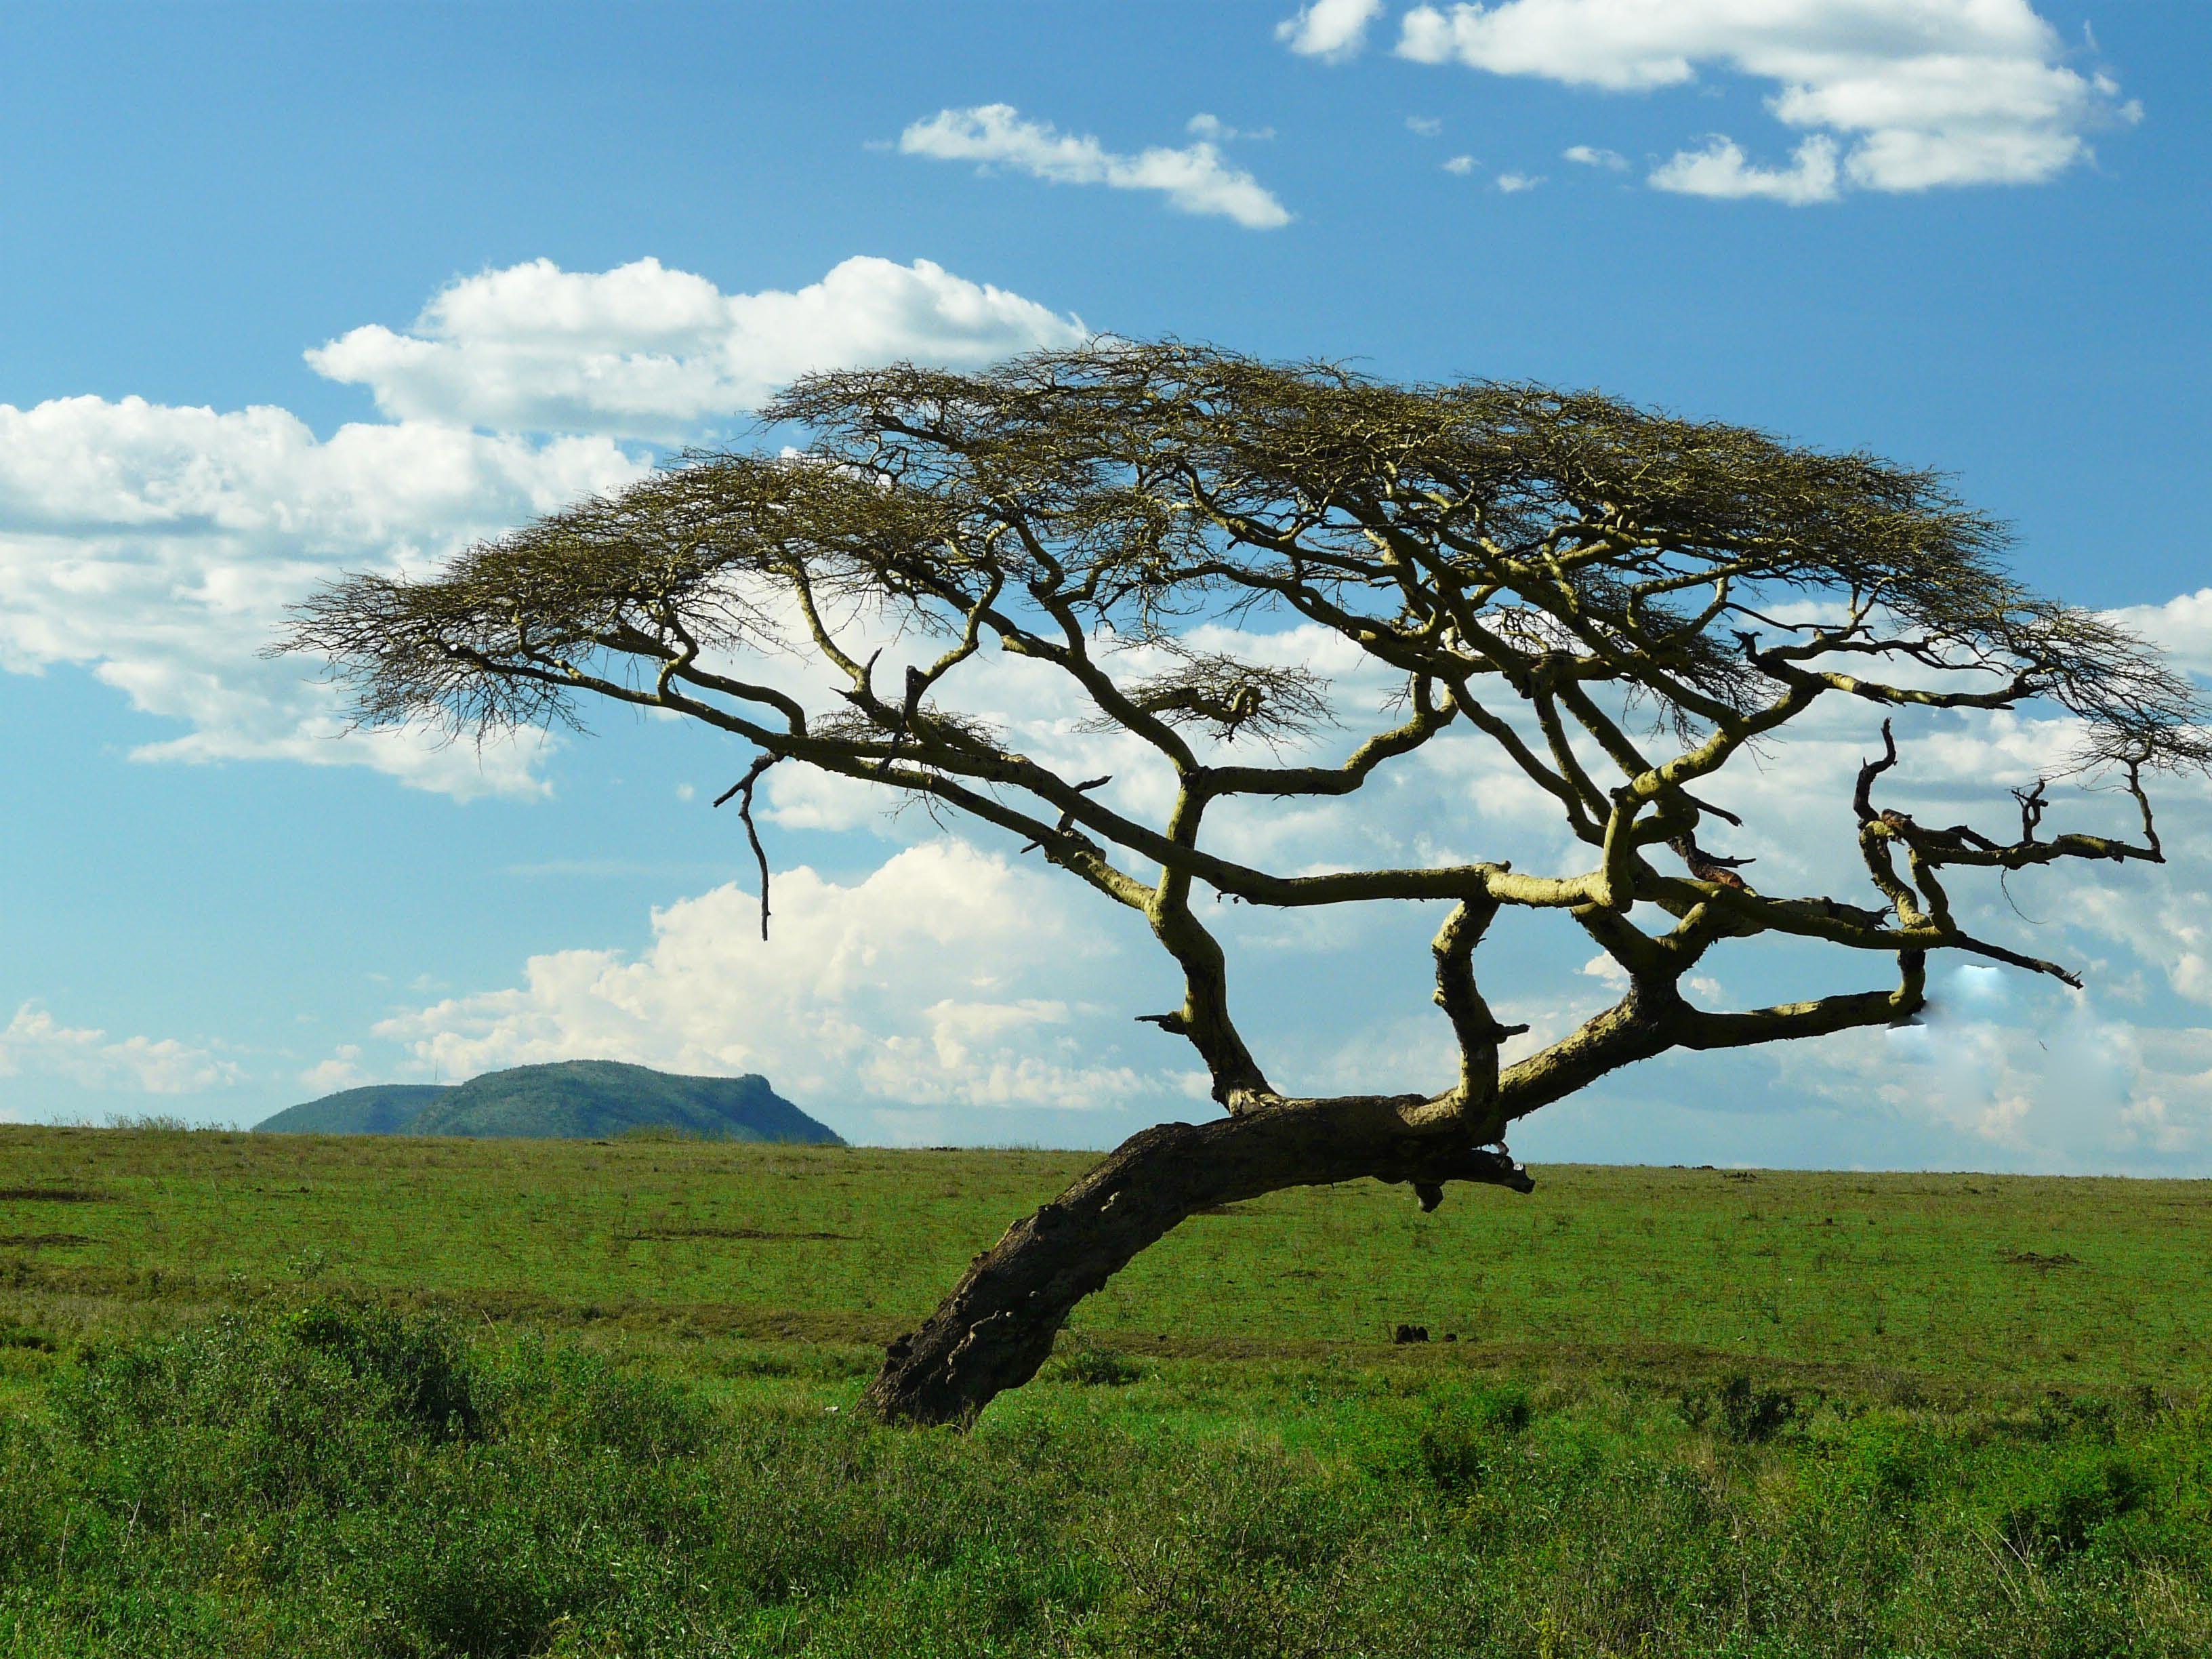 Acacia tree Serengeti Savanna biome, Savanna ecosystem